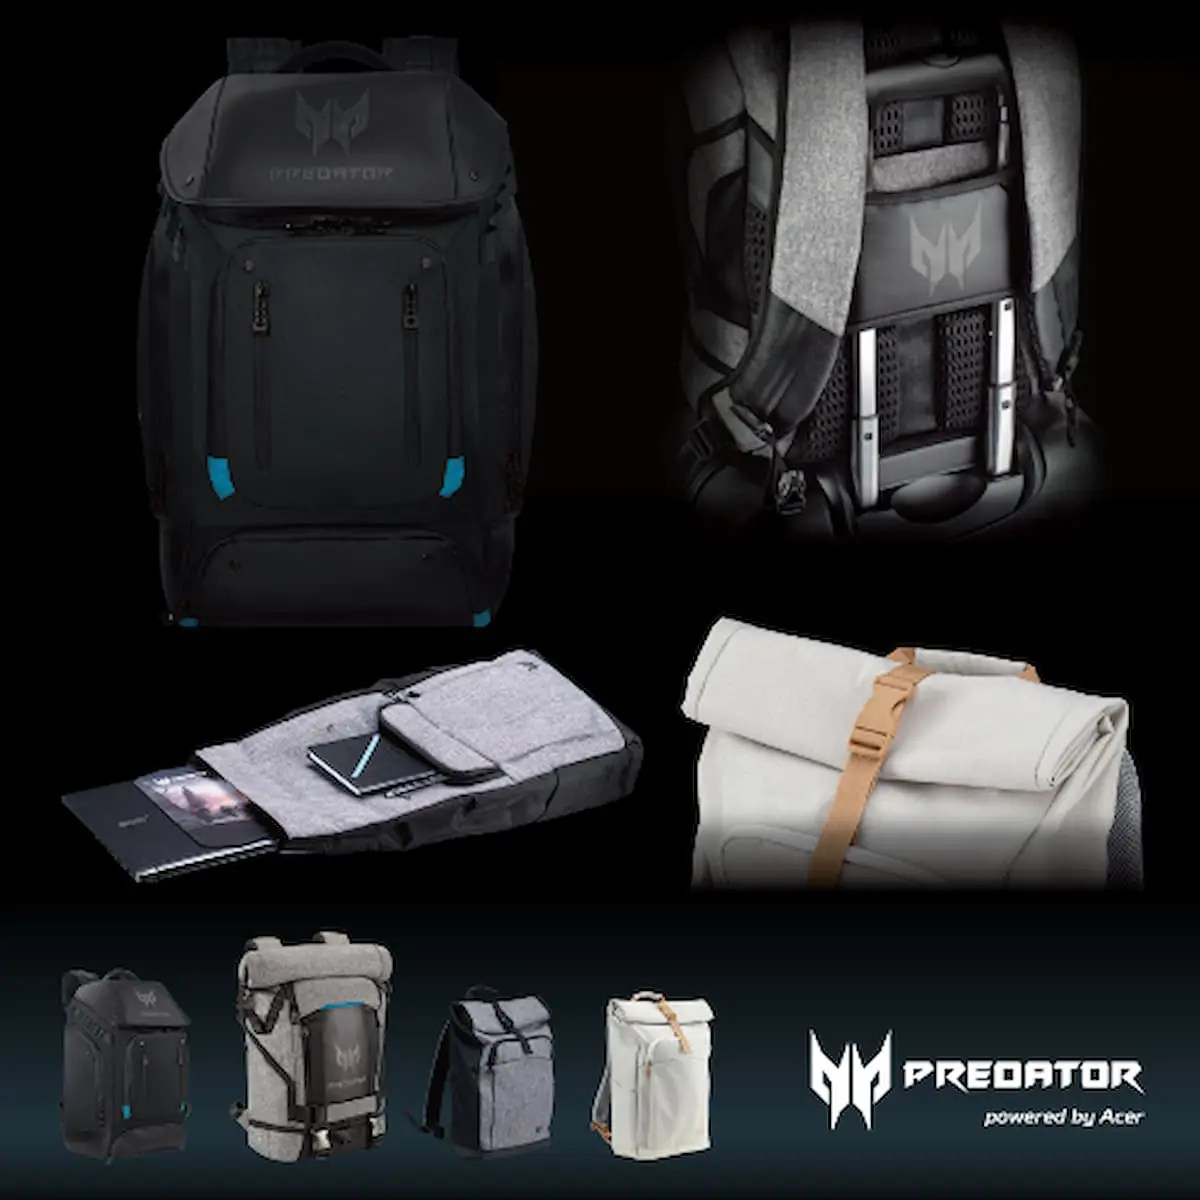 Acer「Predator」ゲーミングバックパック新商品